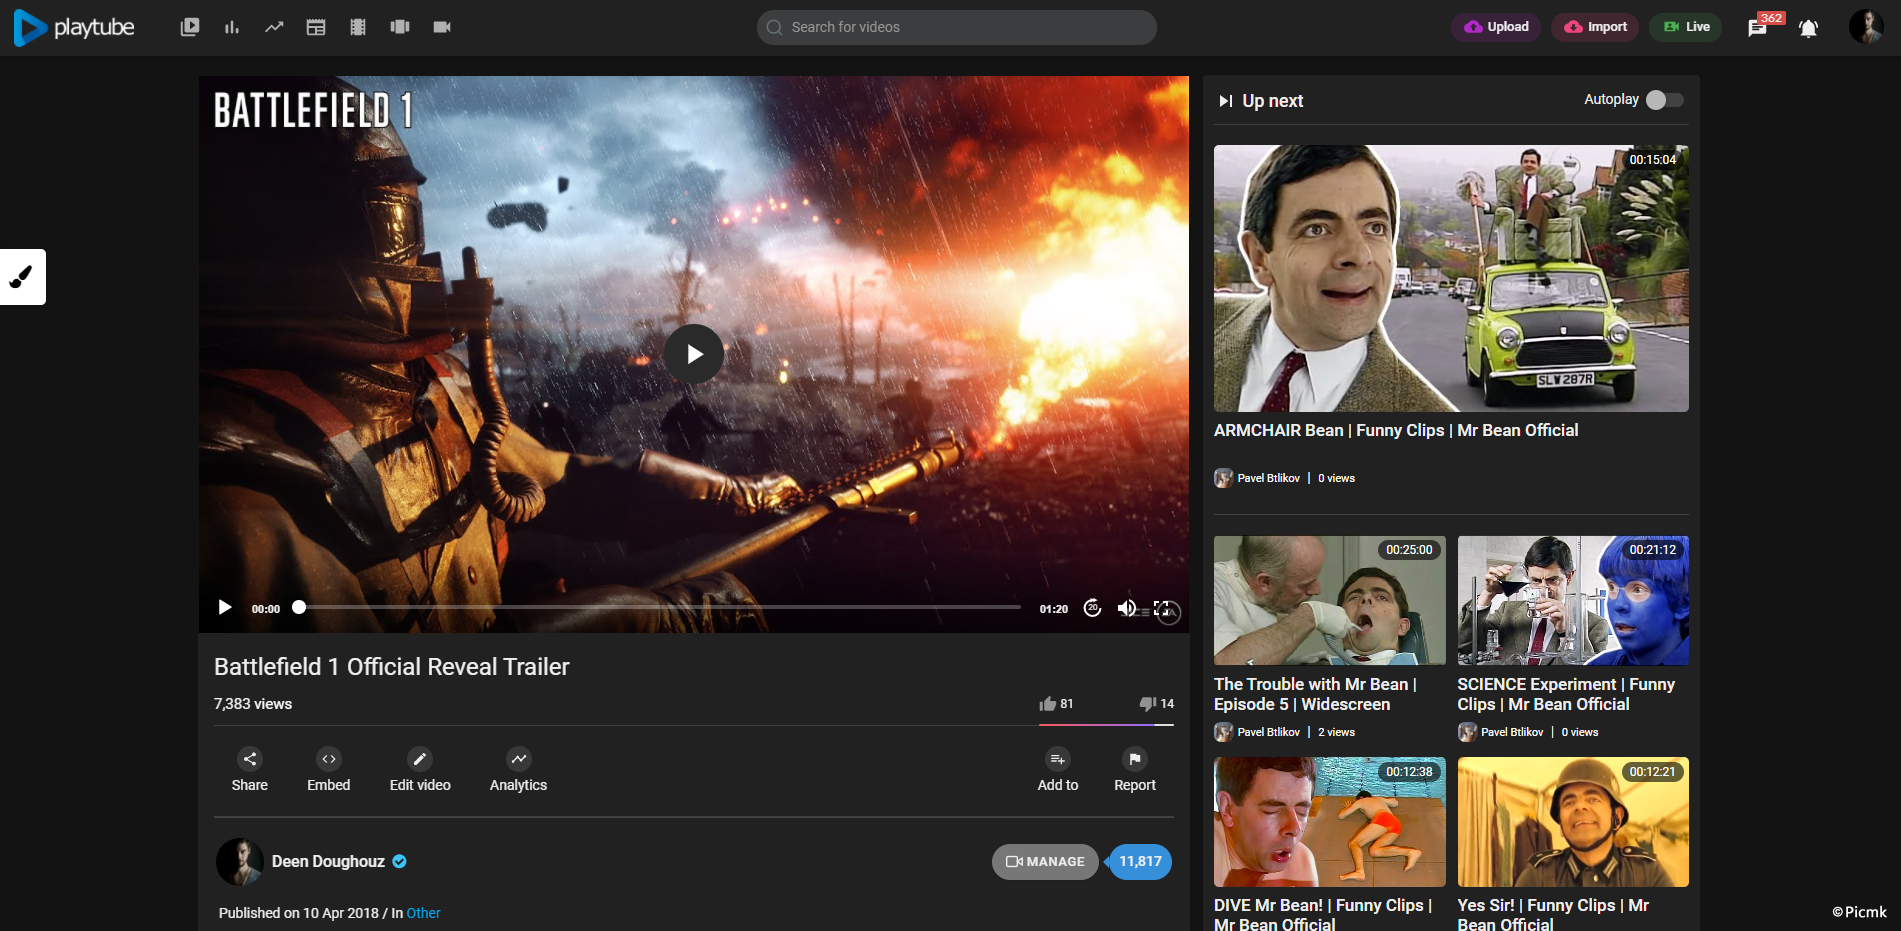 PlayTube v2.0.3 - 國外高級PHP視頻係統源碼 & PHP視頻分享平台源碼插圖5